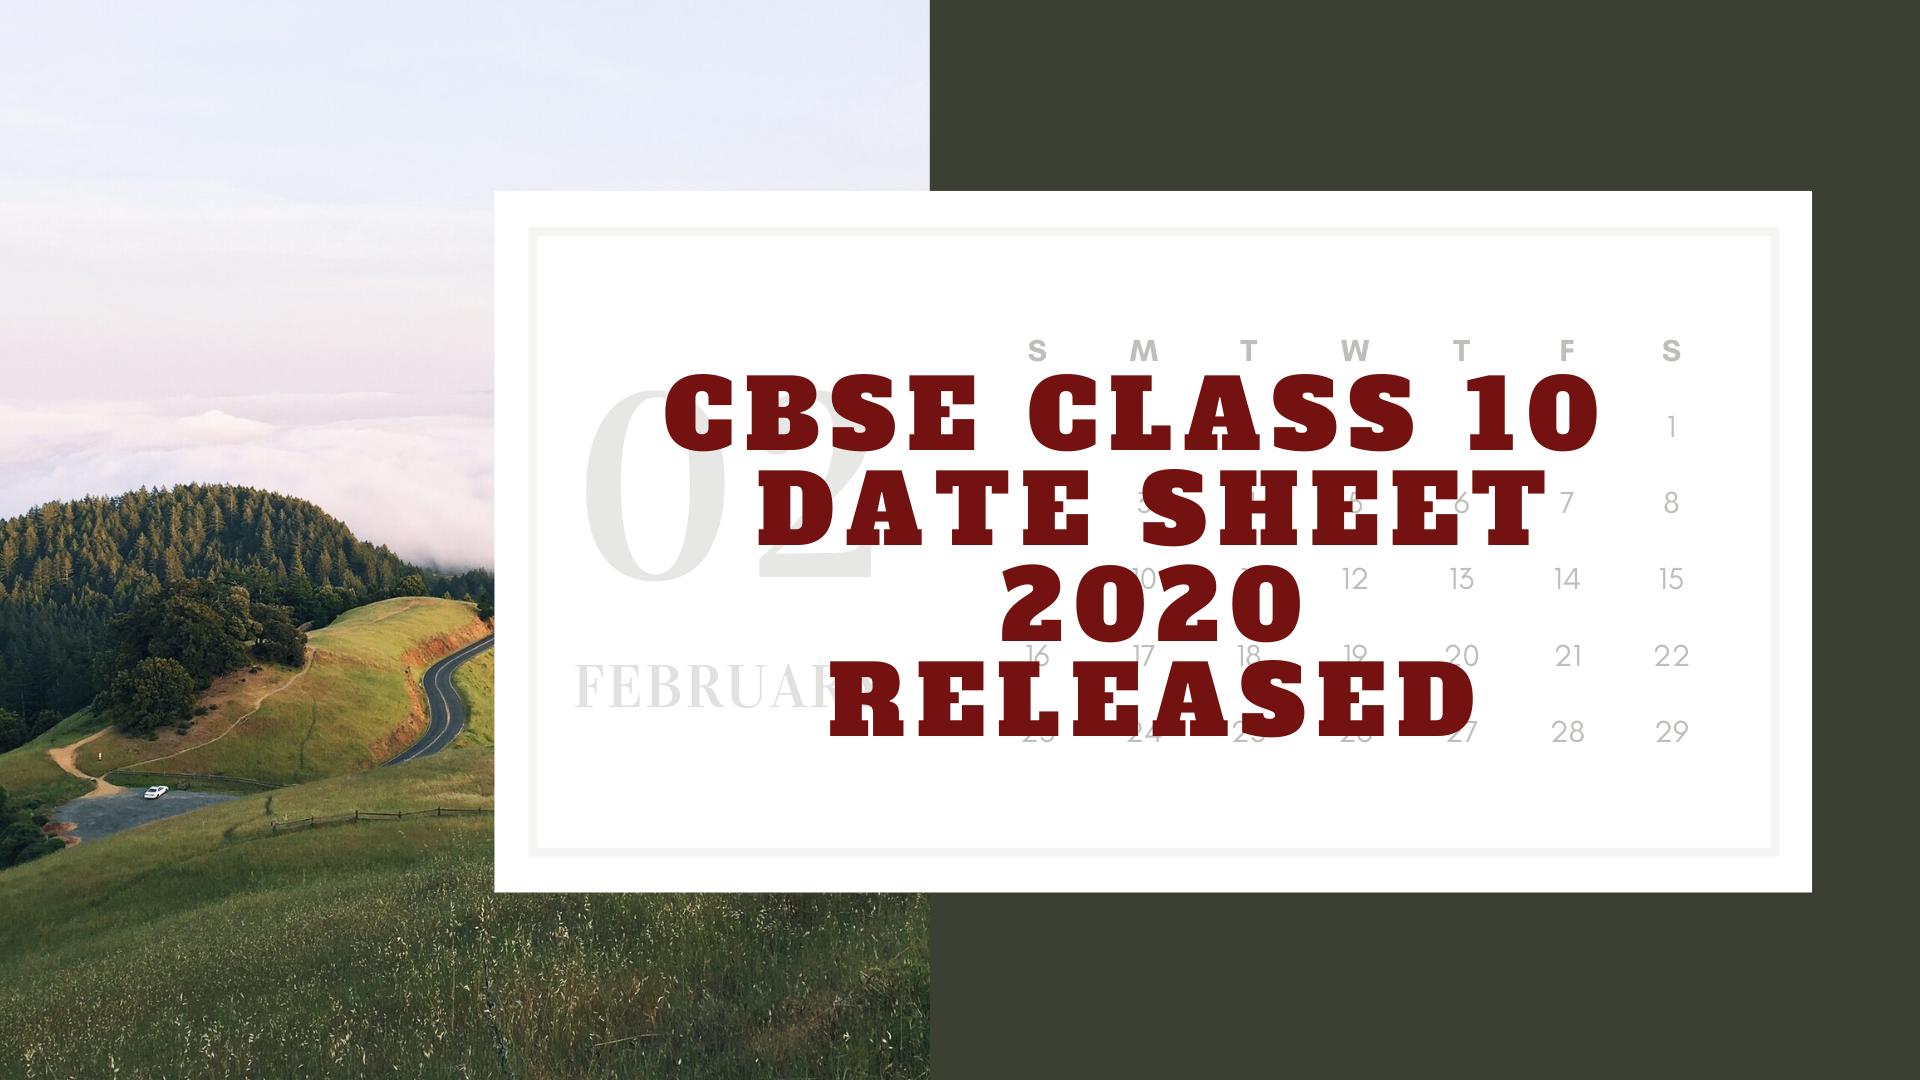 CBSE CLASS 10 DATE SHEET 2020 RELEASED